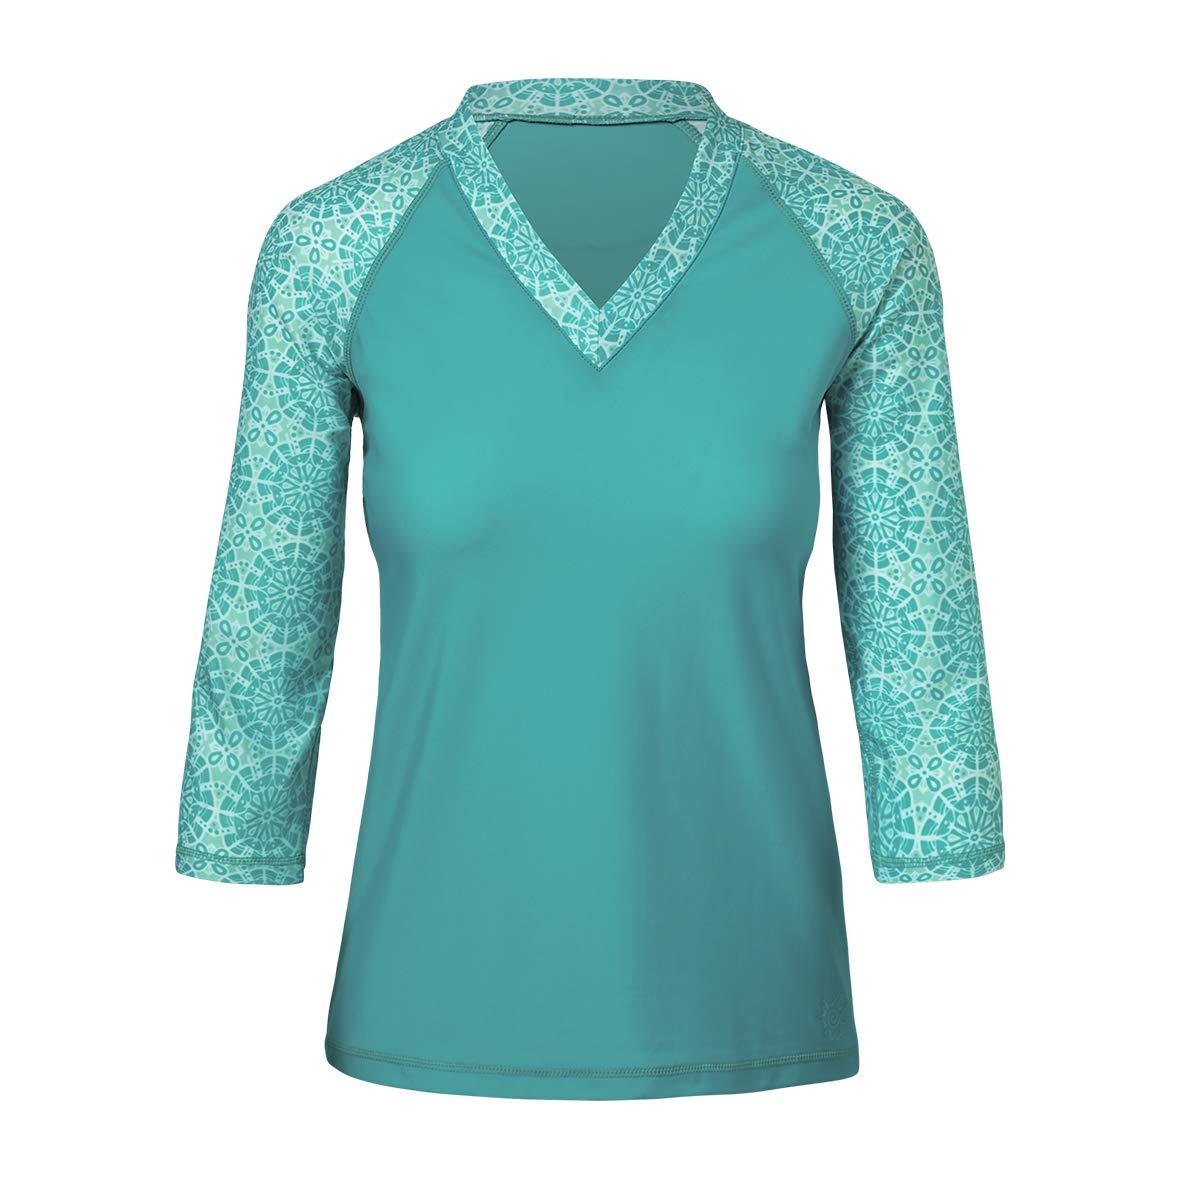 V-Neck Sun and Swim Shirt with Free Keychain UV Skinz Women/'s UPF 50